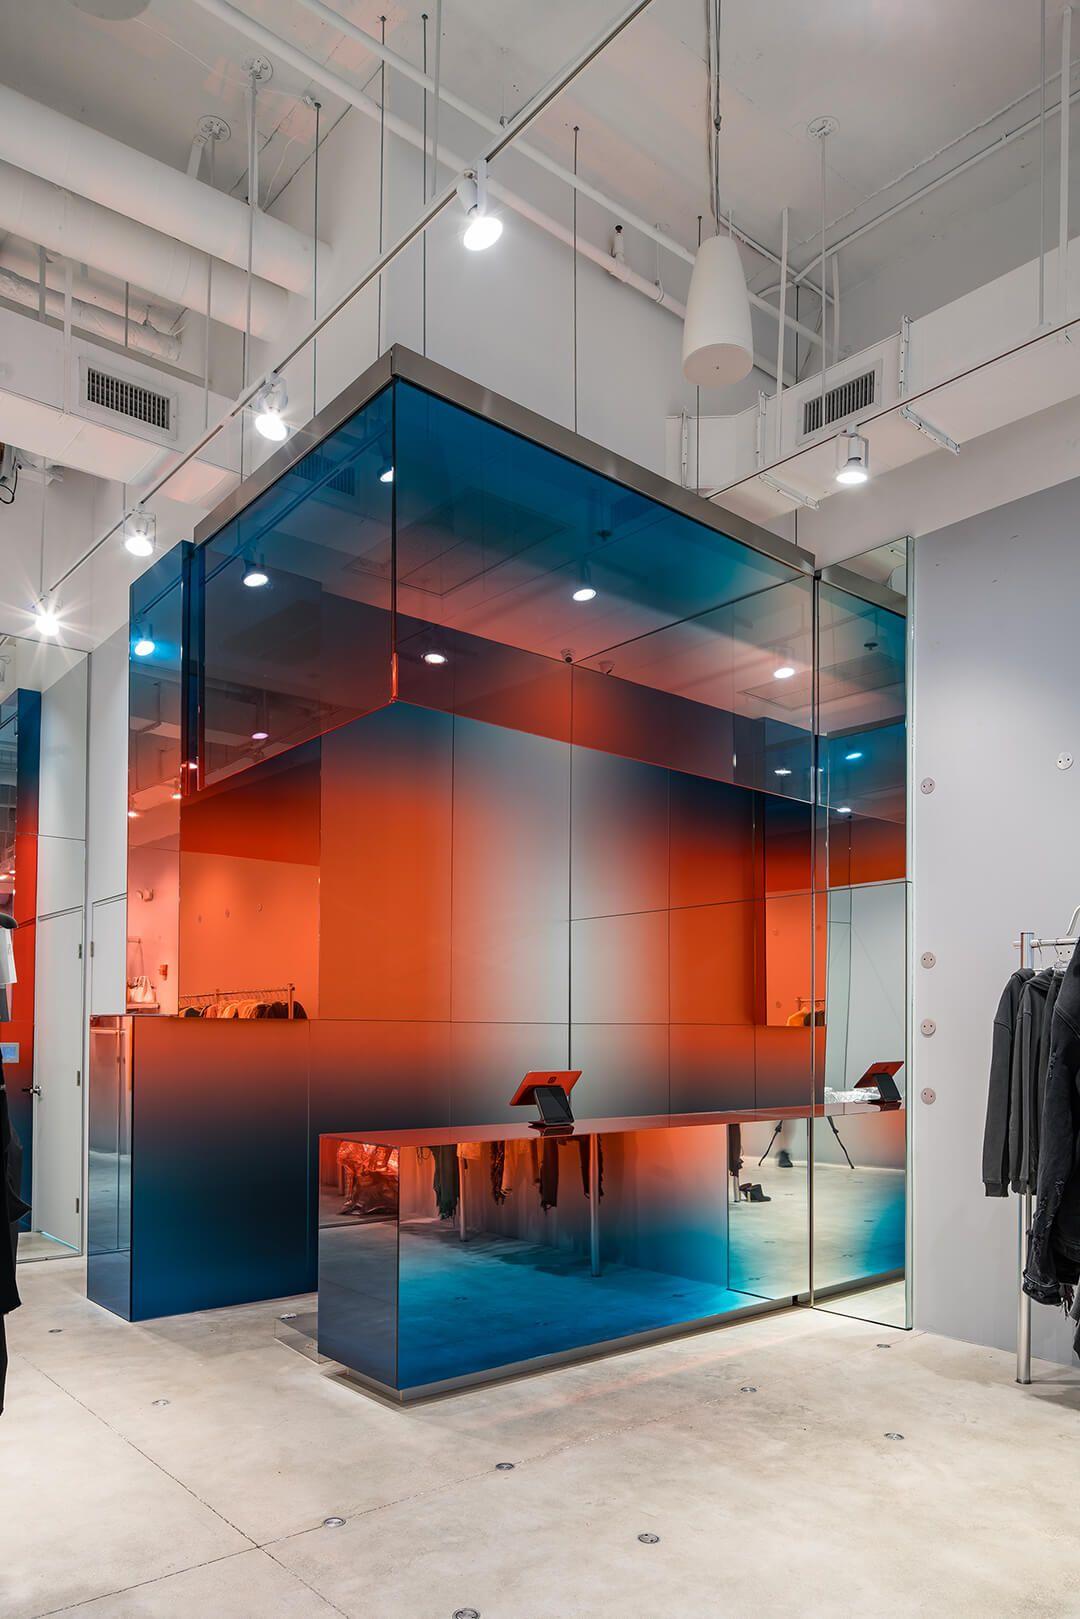 Why Miami's luxury retail market is dressing down - News - Frameweb